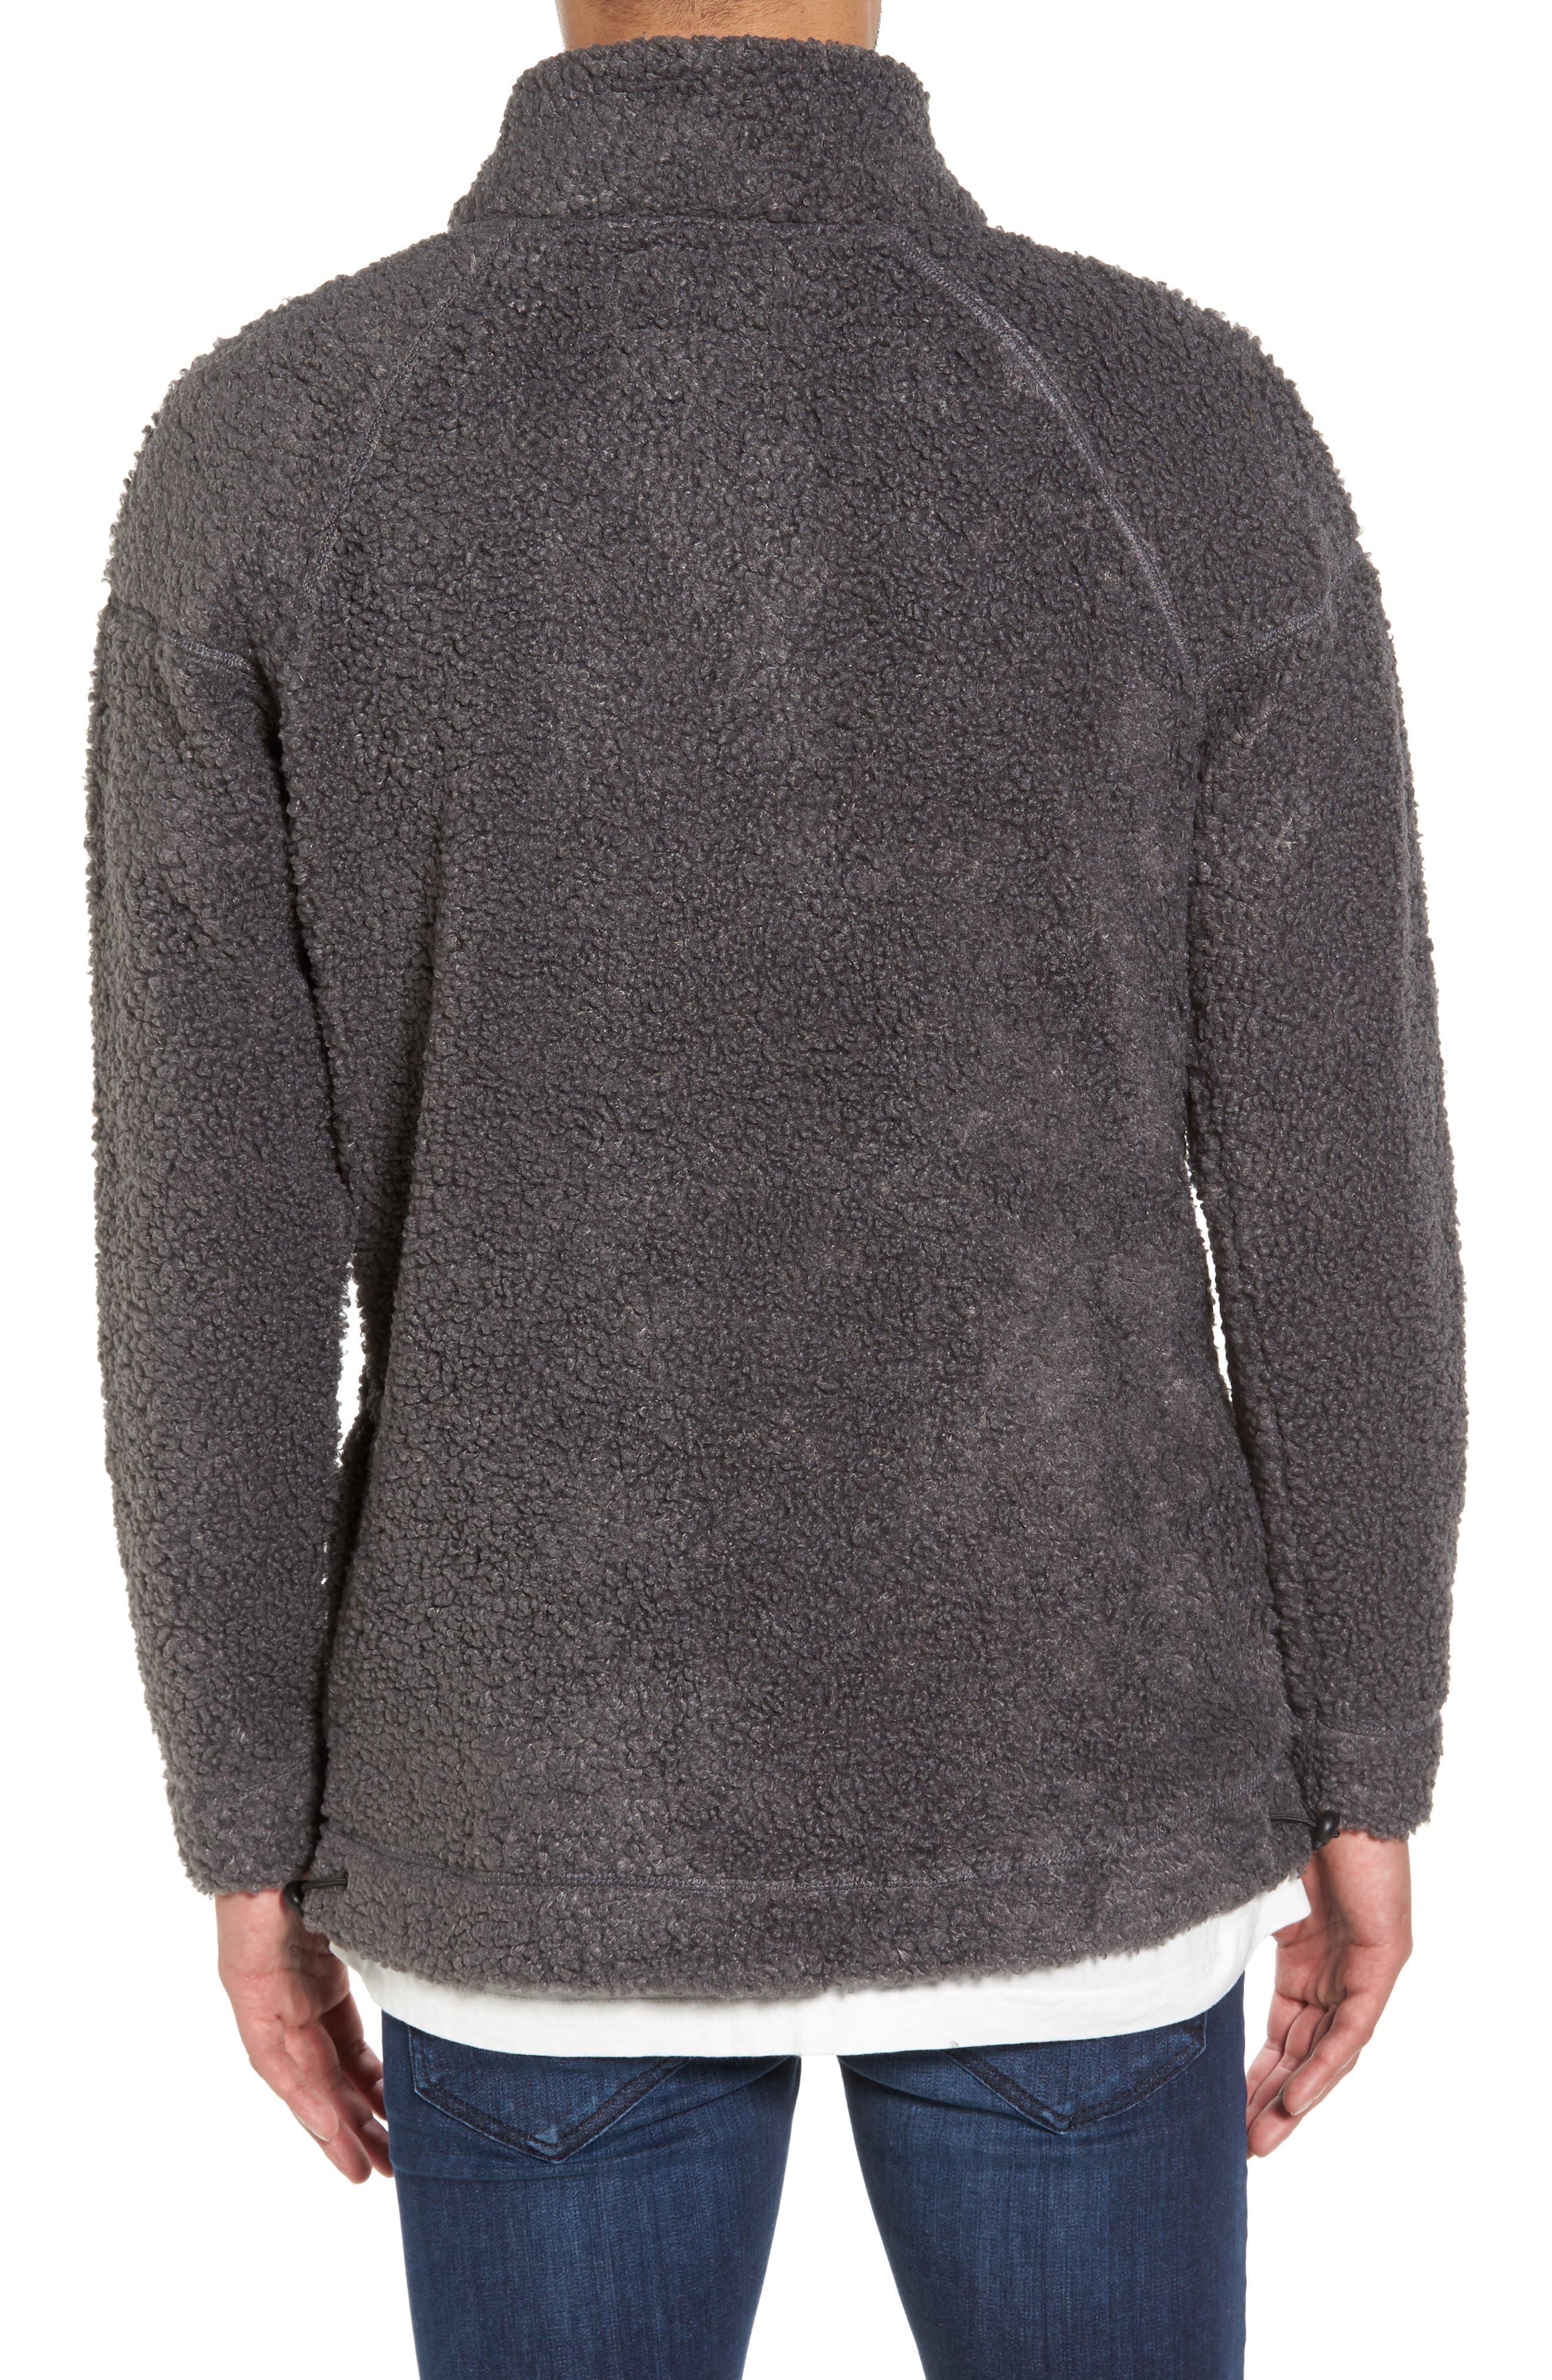 Warlock Faux Shearling Quarter Zip Sweater,                             Alternate thumbnail 2, color,